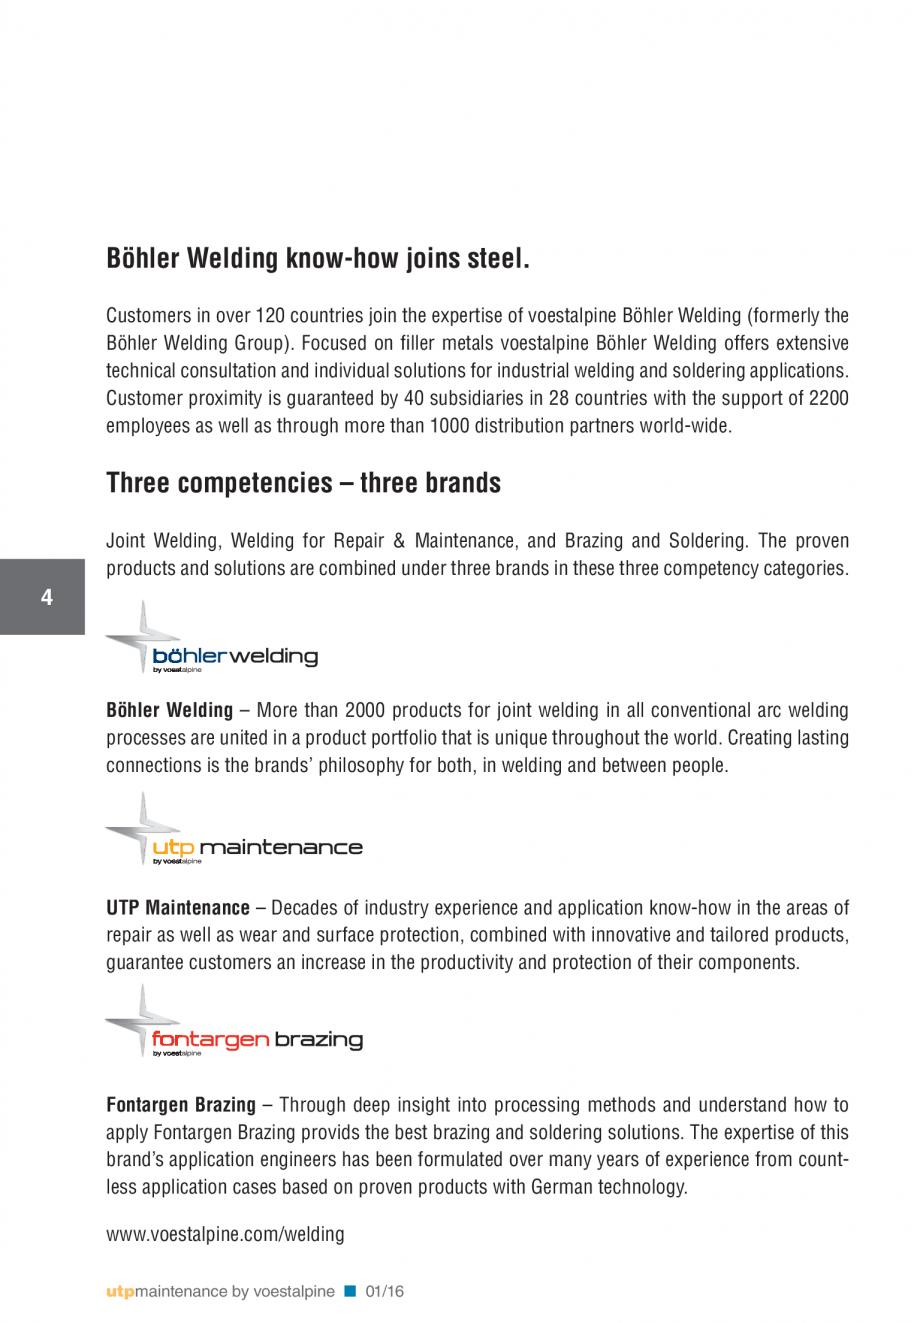 Pagina 6 - Solutii complete (materiale de adaos) pentru mentenanta si reparatii TEHNIC GAZ WELDING...